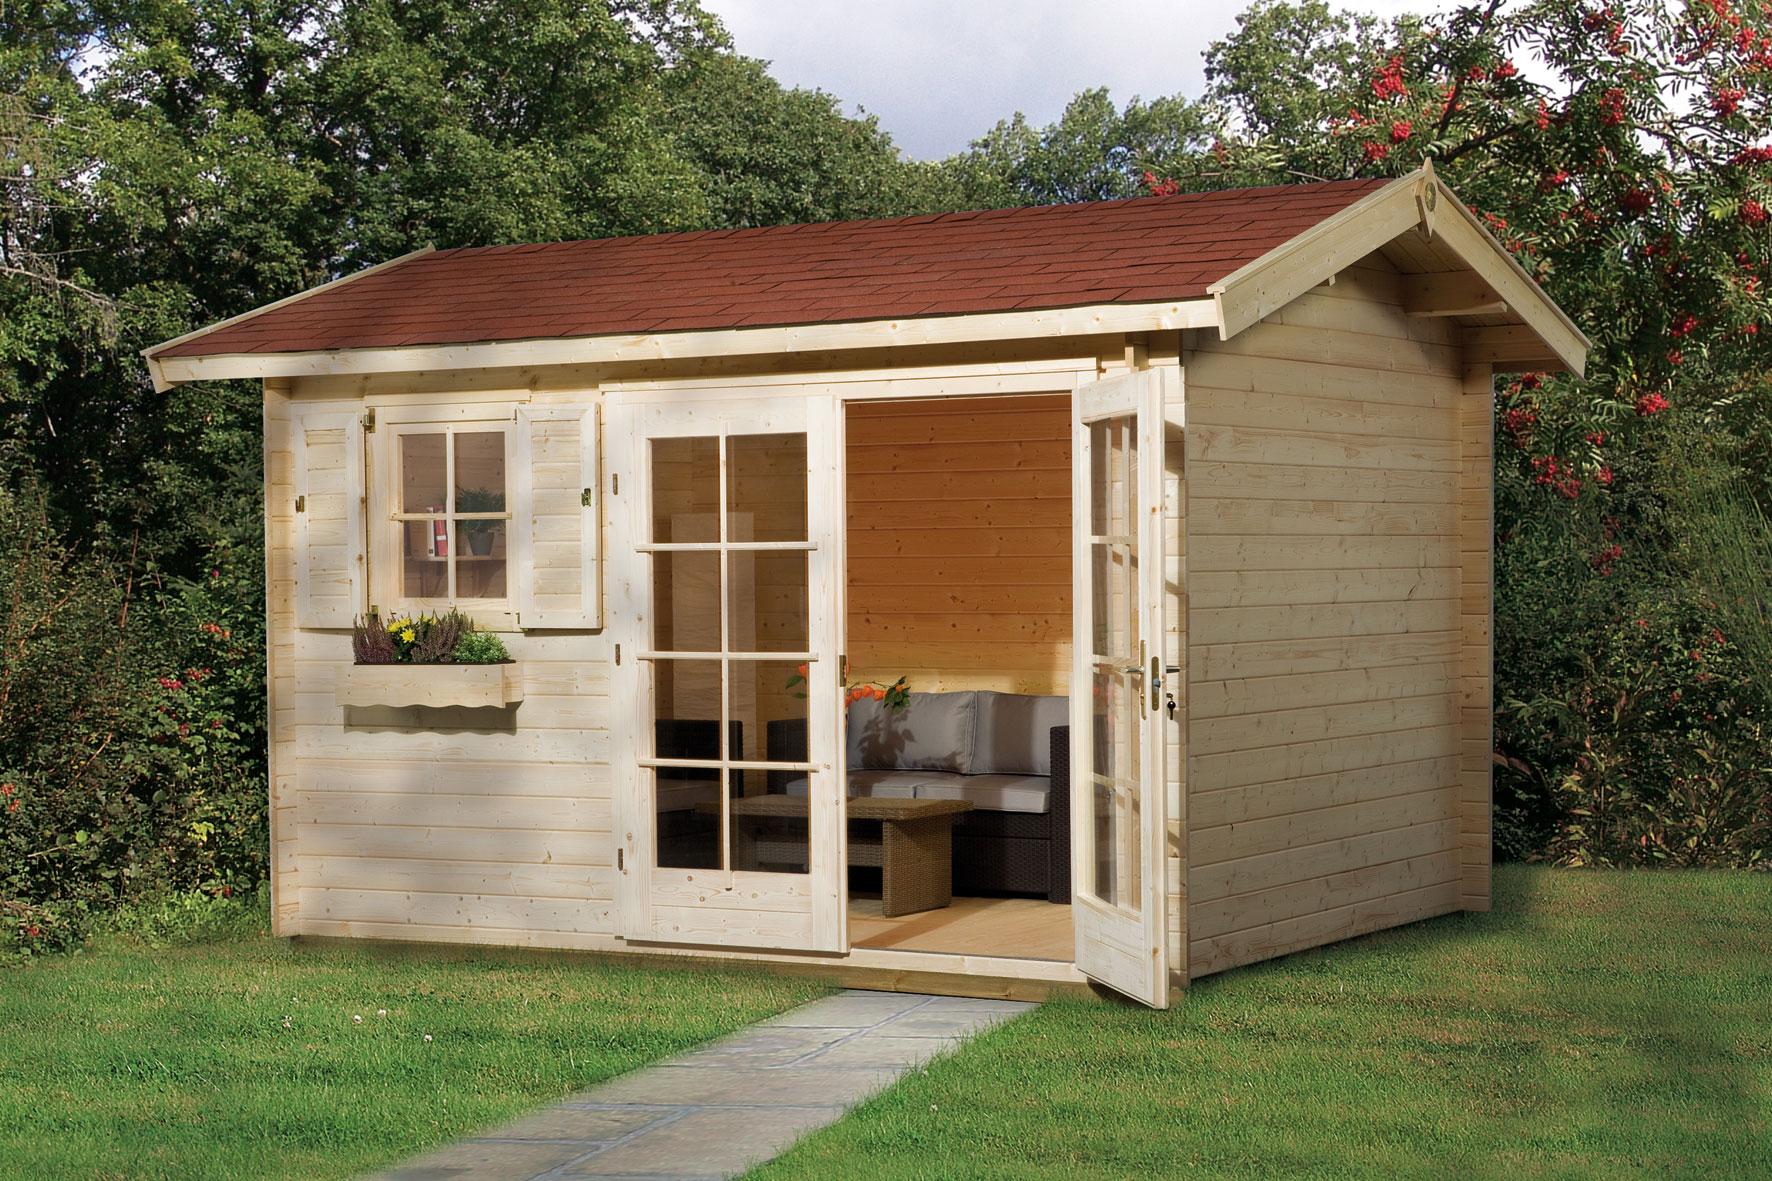 blockbohlen gartenhaus top gartenhaus skanholz gent. Black Bedroom Furniture Sets. Home Design Ideas